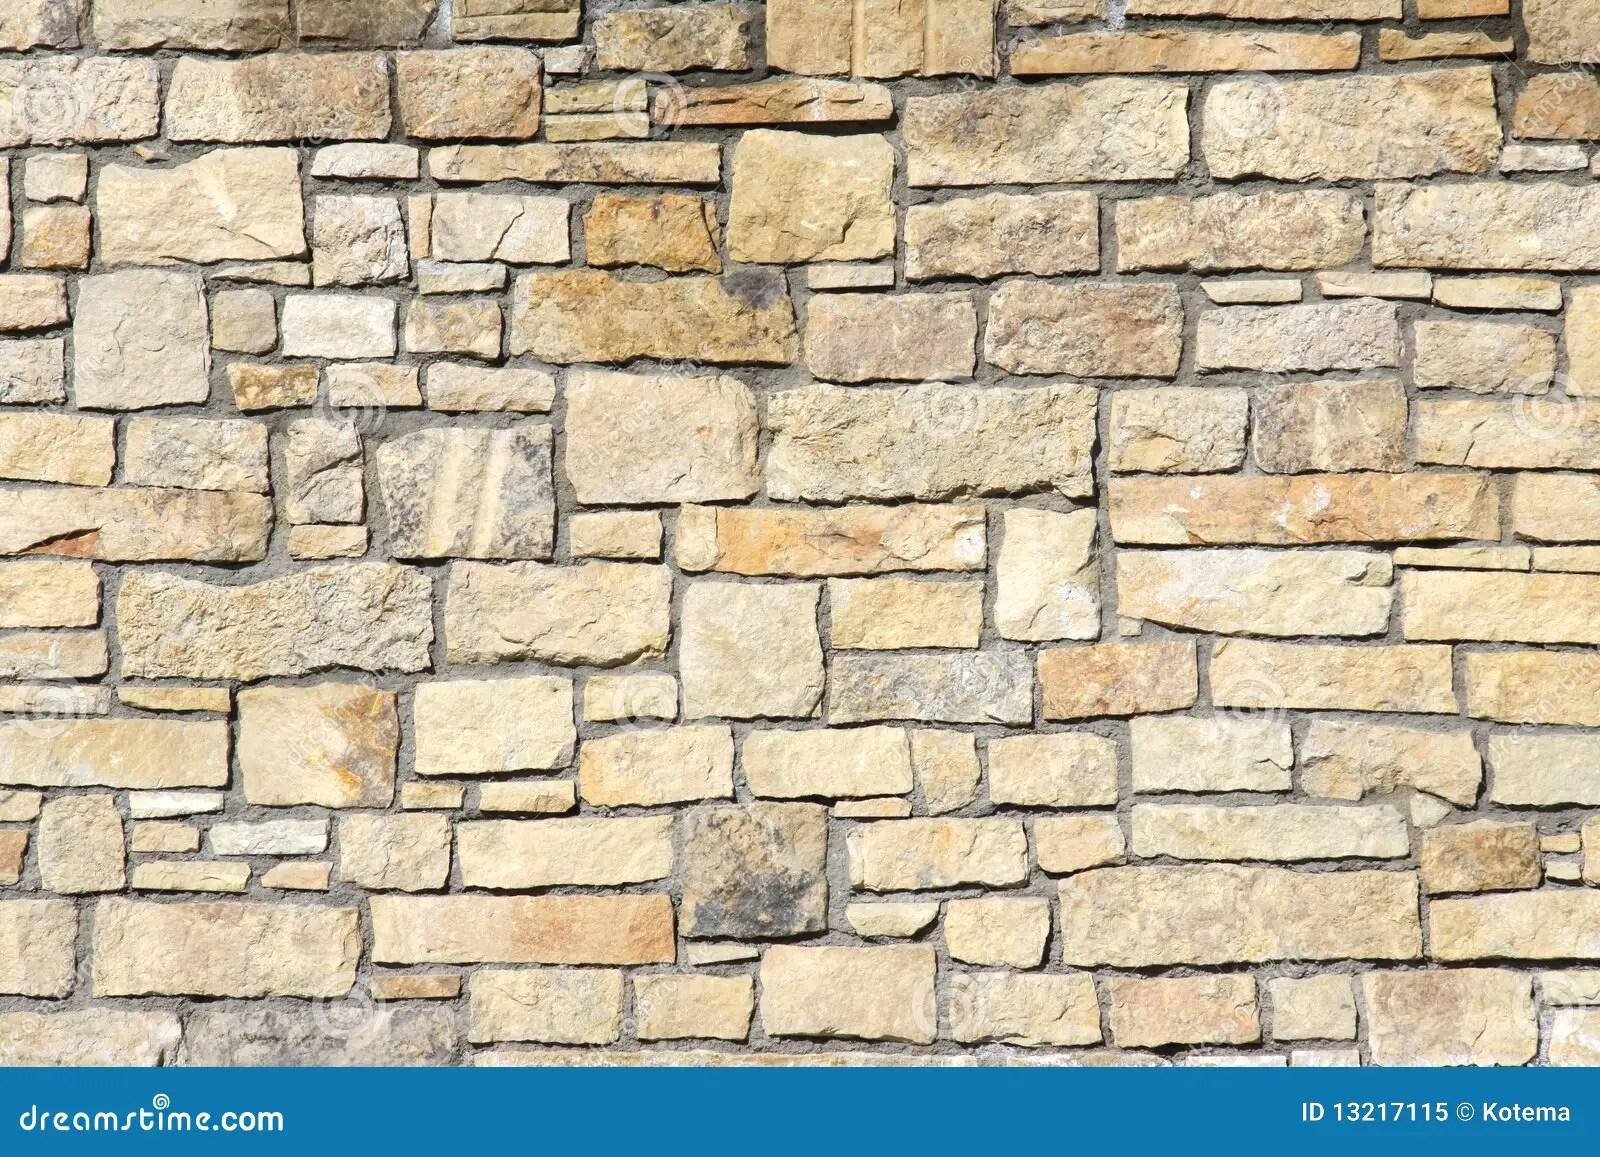 Stone Wall Royalty Free Stock Photo Image 13217115